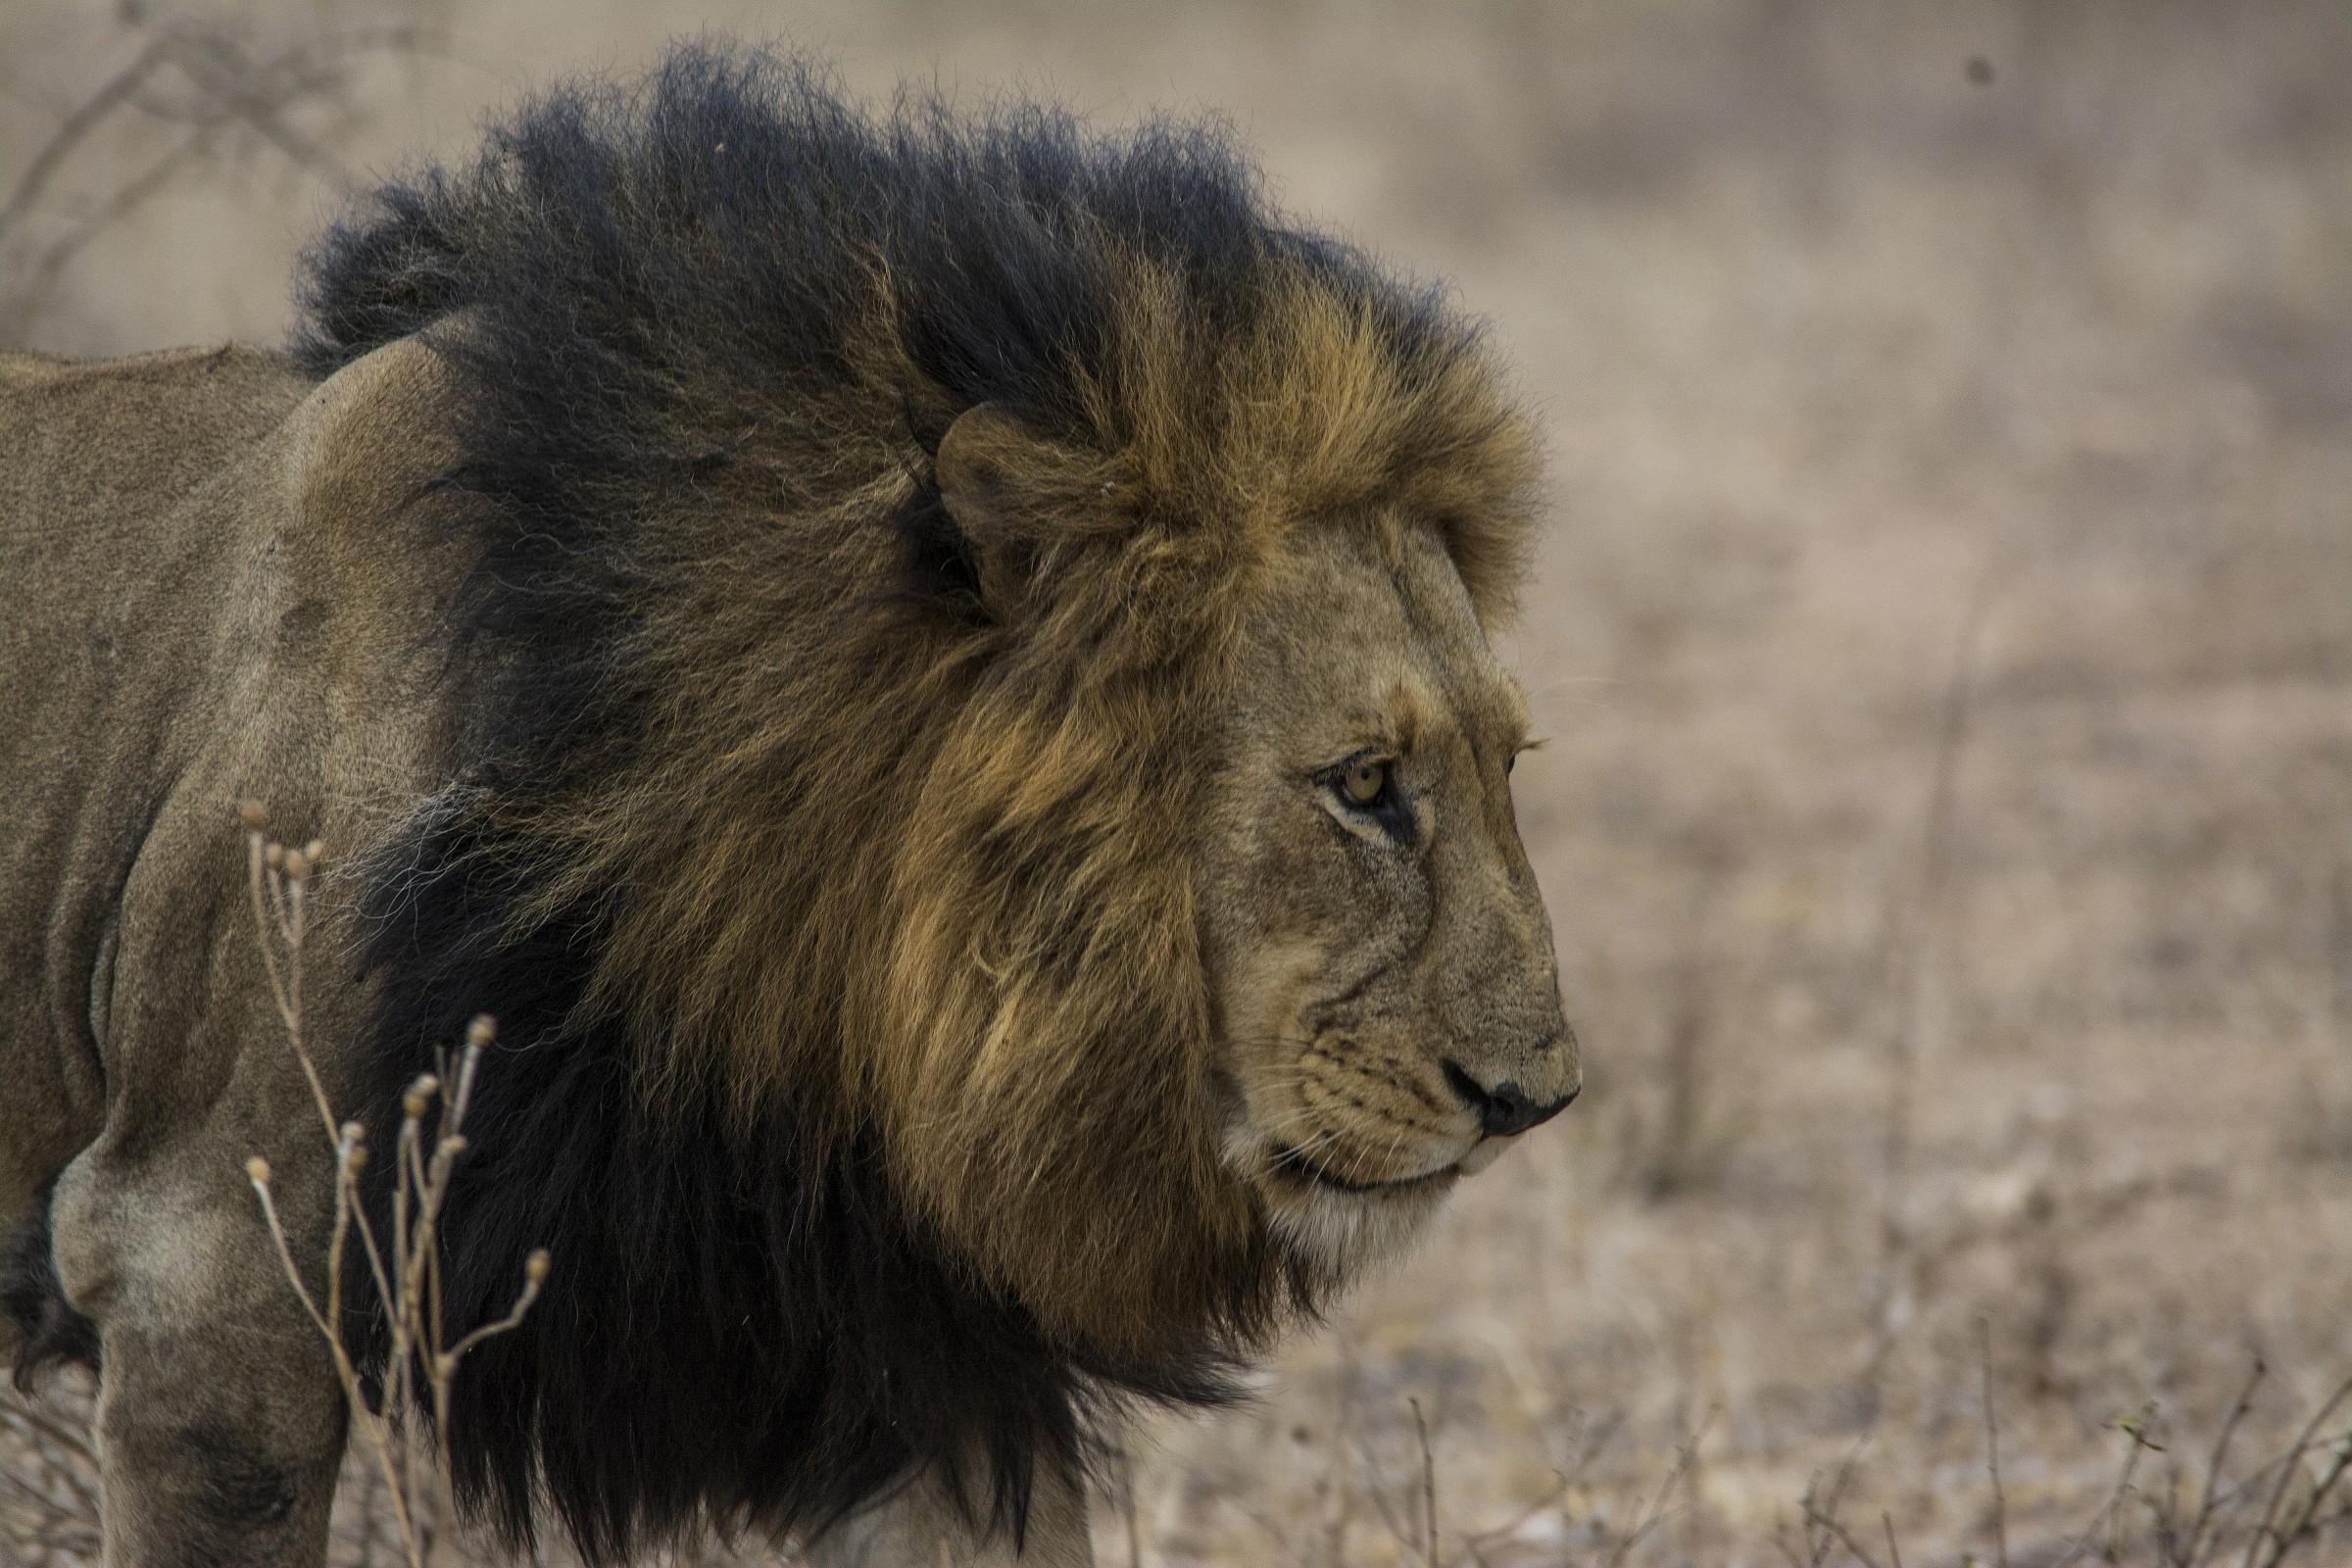 The walking lion...